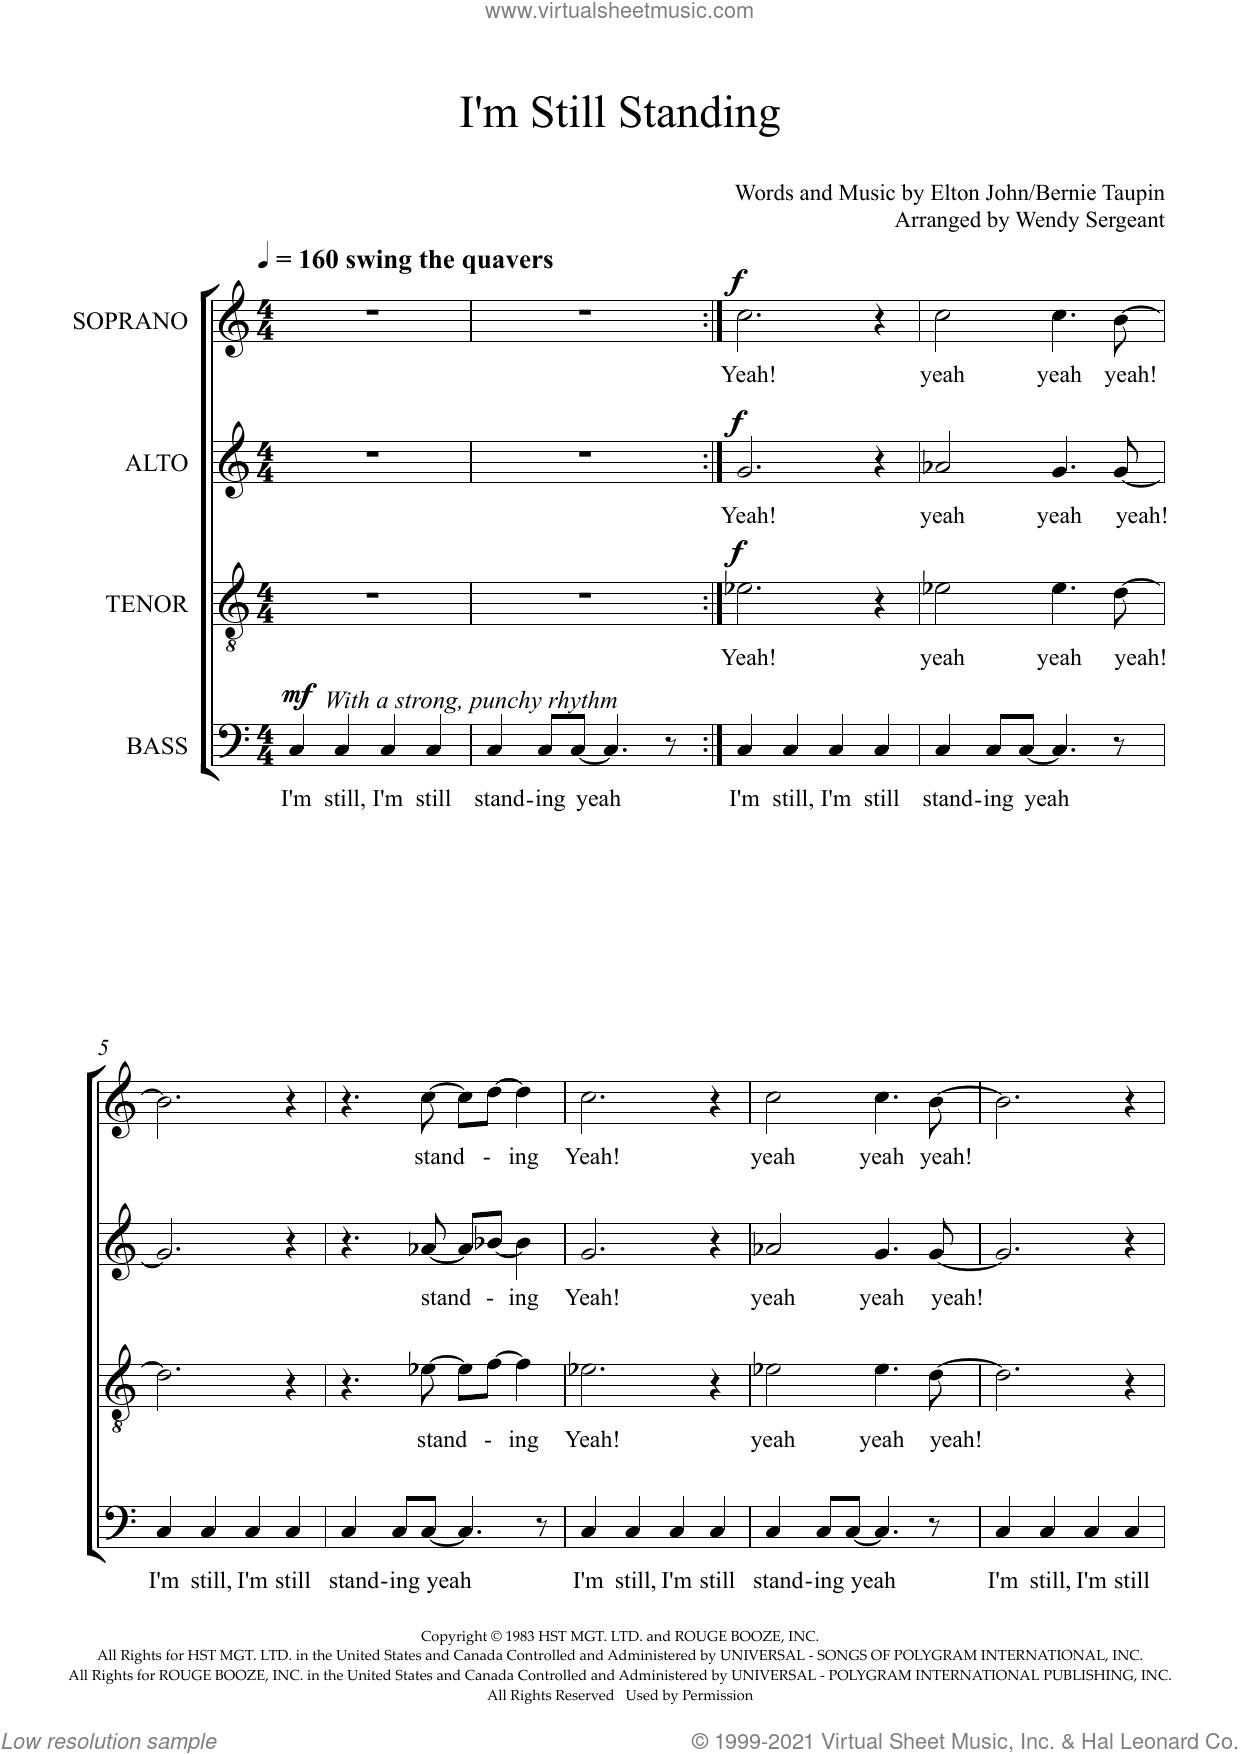 I'm Still Standing (arr. Wendy Sergeant) sheet music for choir (SATB: soprano, alto, tenor, bass) by Elton John, Wendy Sergeant and Bernie Taupin, intermediate skill level